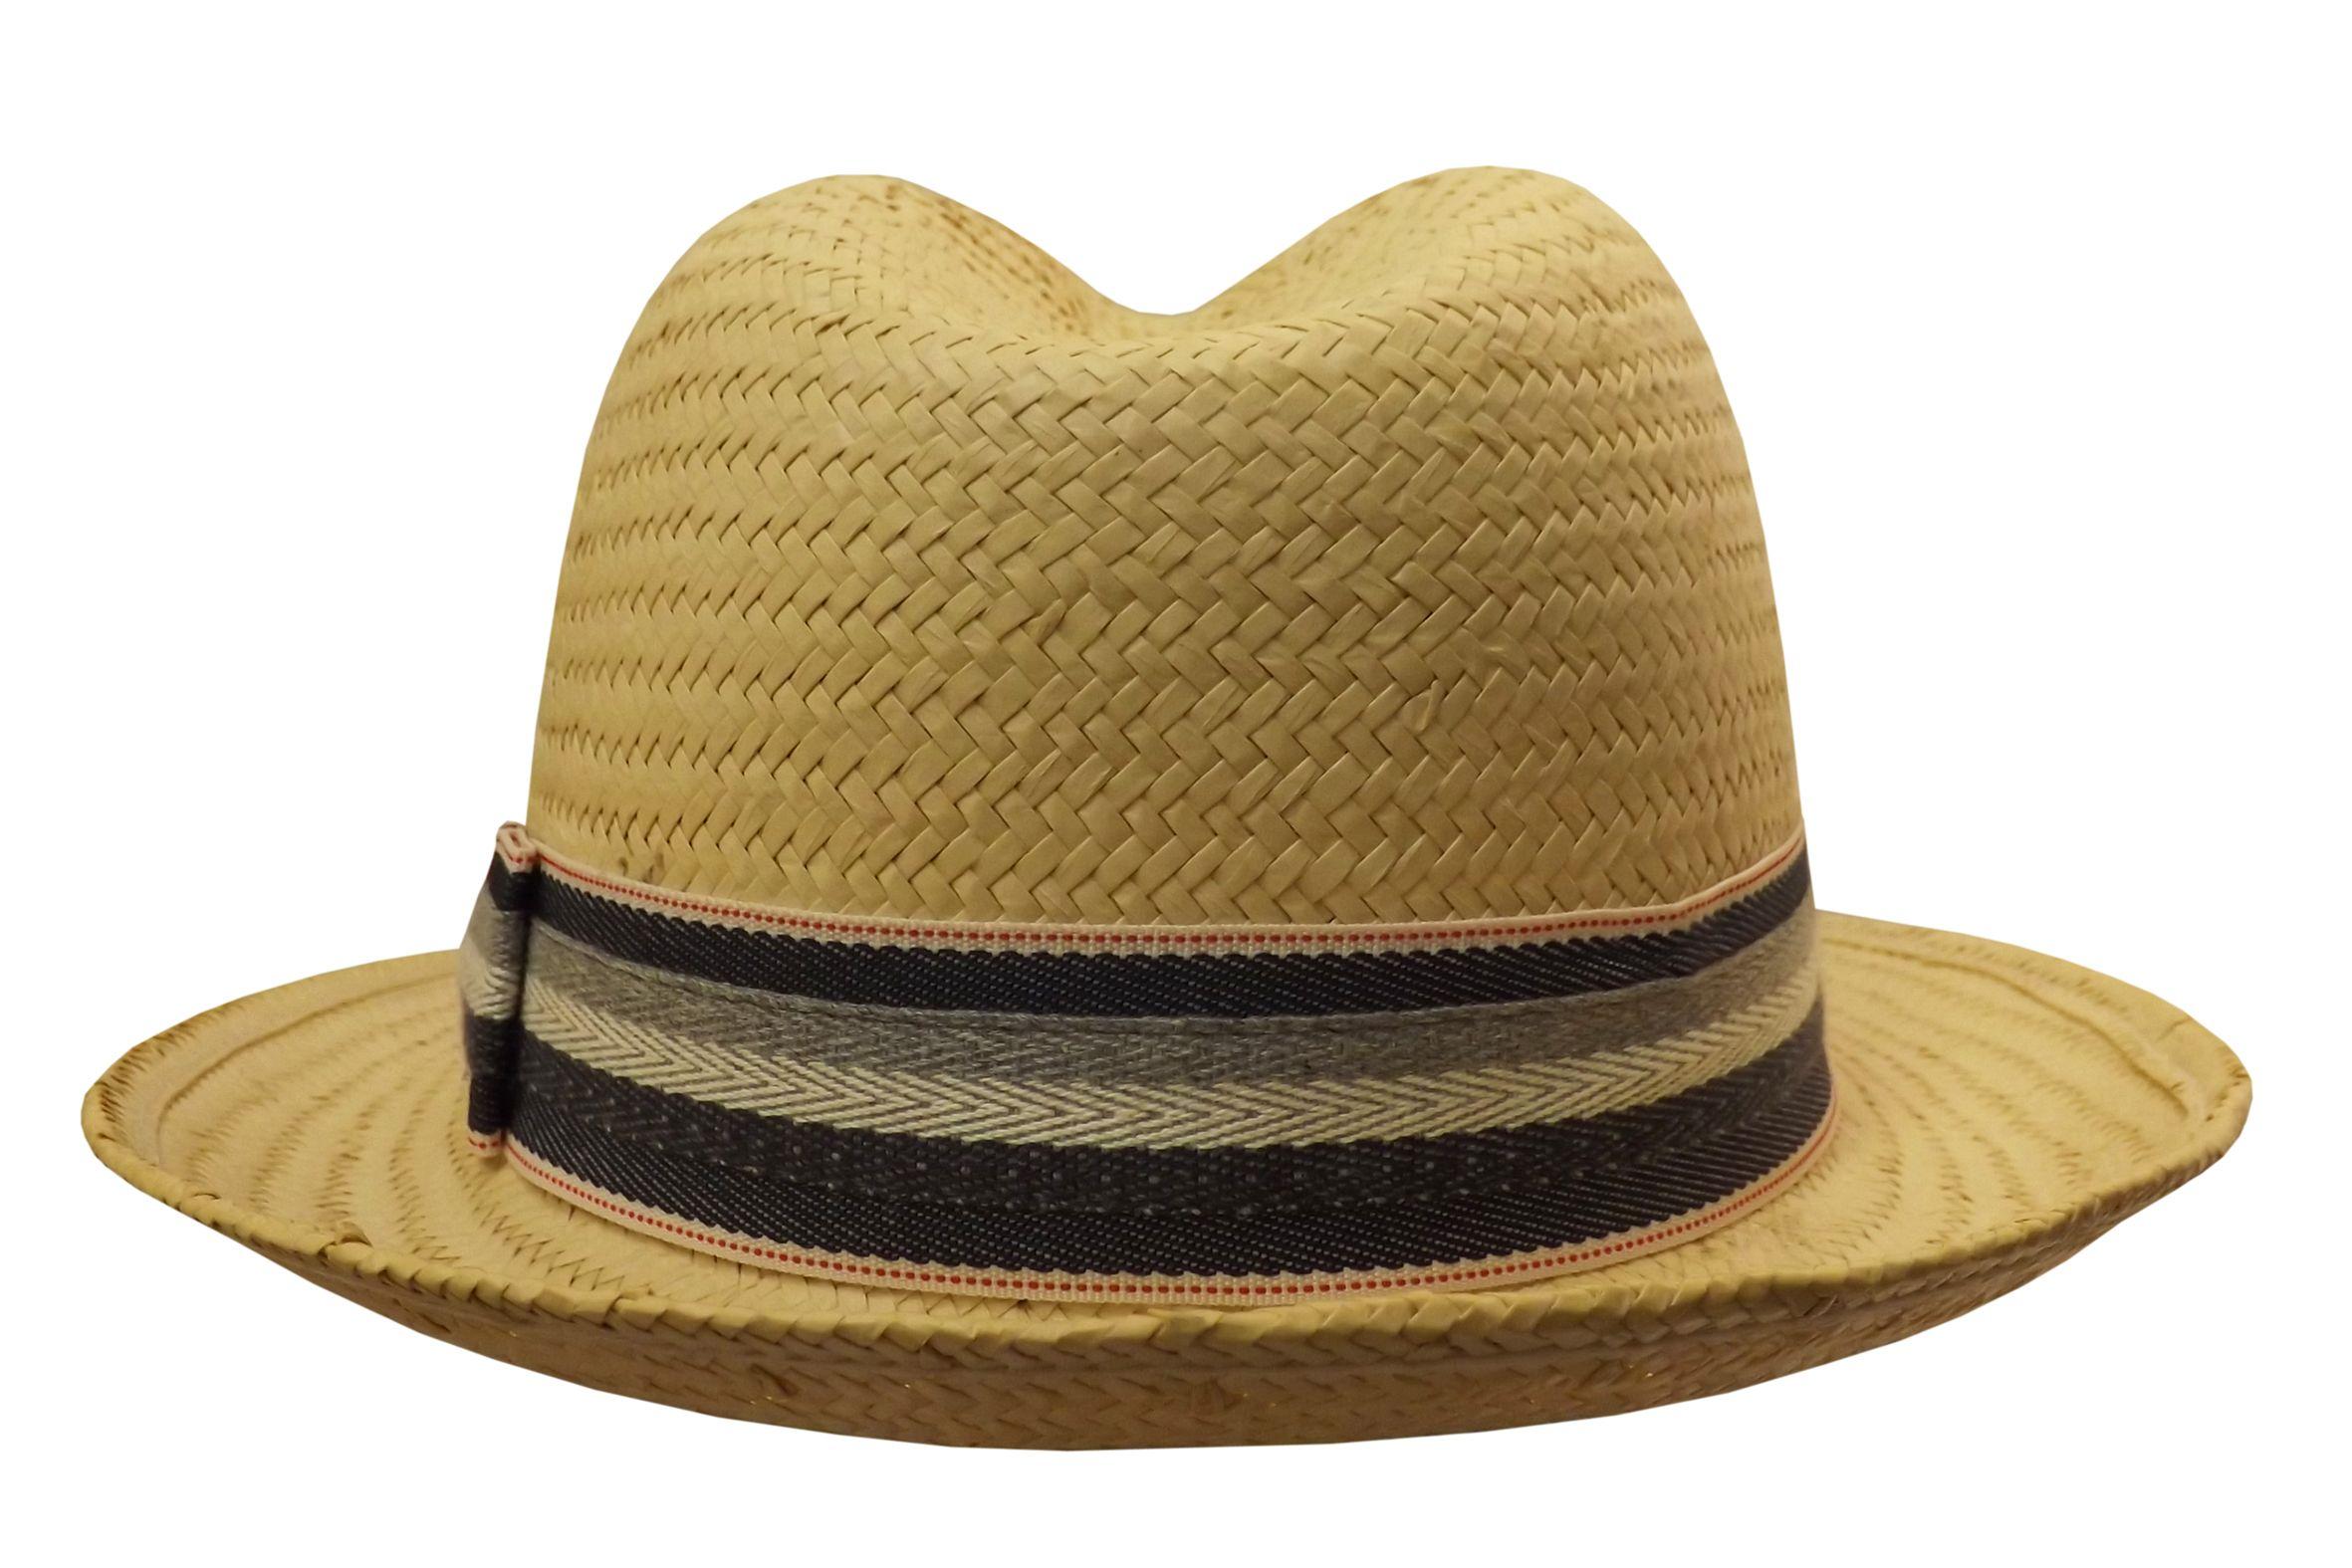 straw cuban hat - Google Search  5a8c040289e